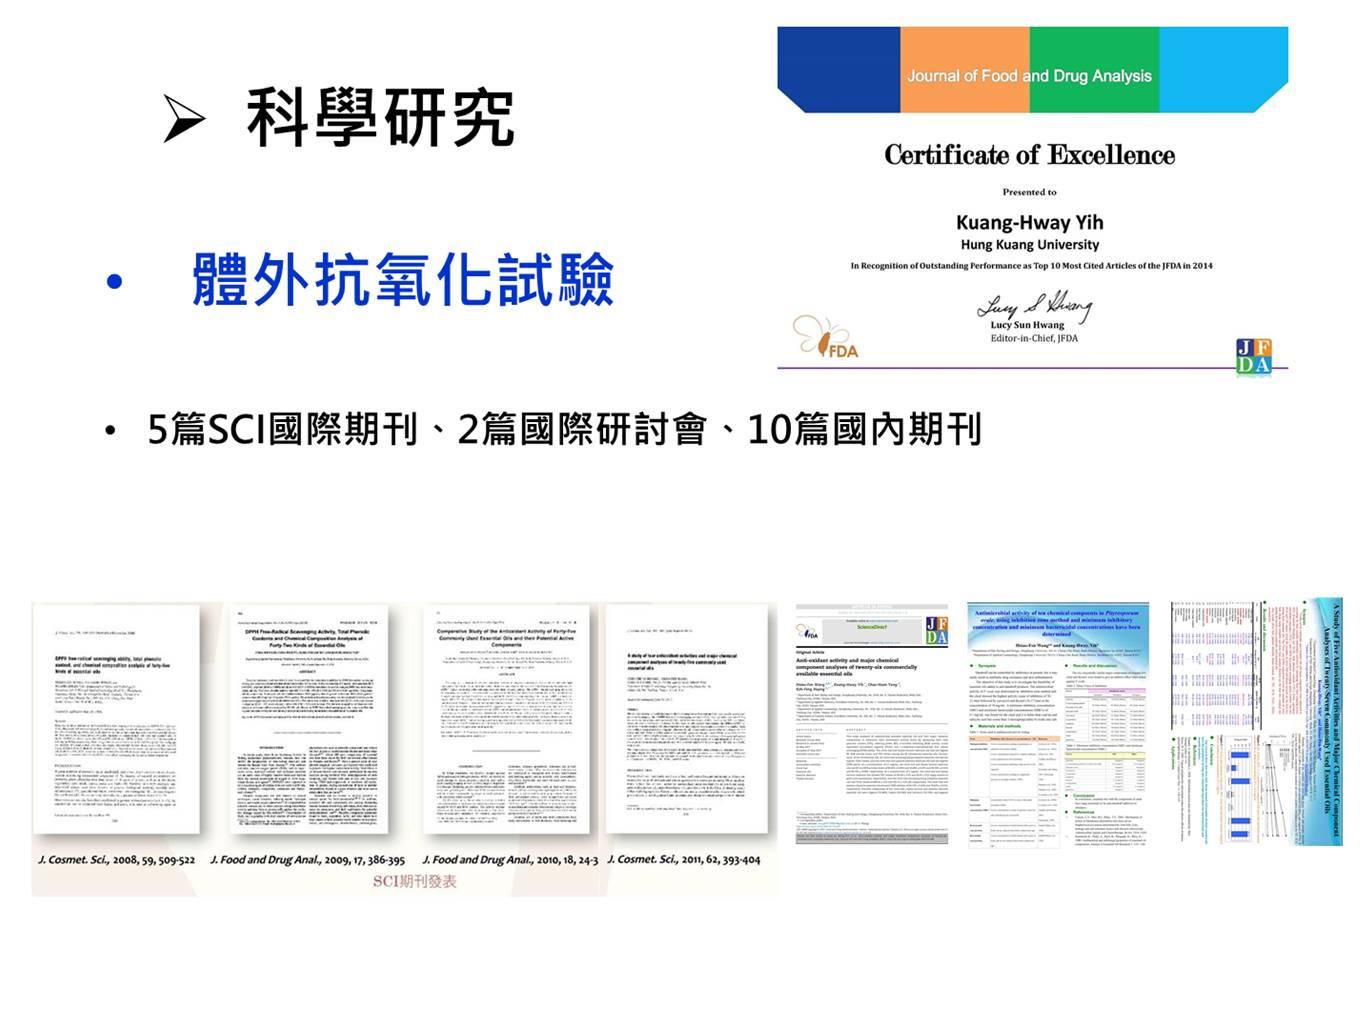 已發表5篇國際期刊,於J. Cosmetic Sci.、J. Food Drug Anal.國際SCI期刊,刊載於J. Food Drug Anal.的論文於2014年亦獲得TOP 10引用次數第3名